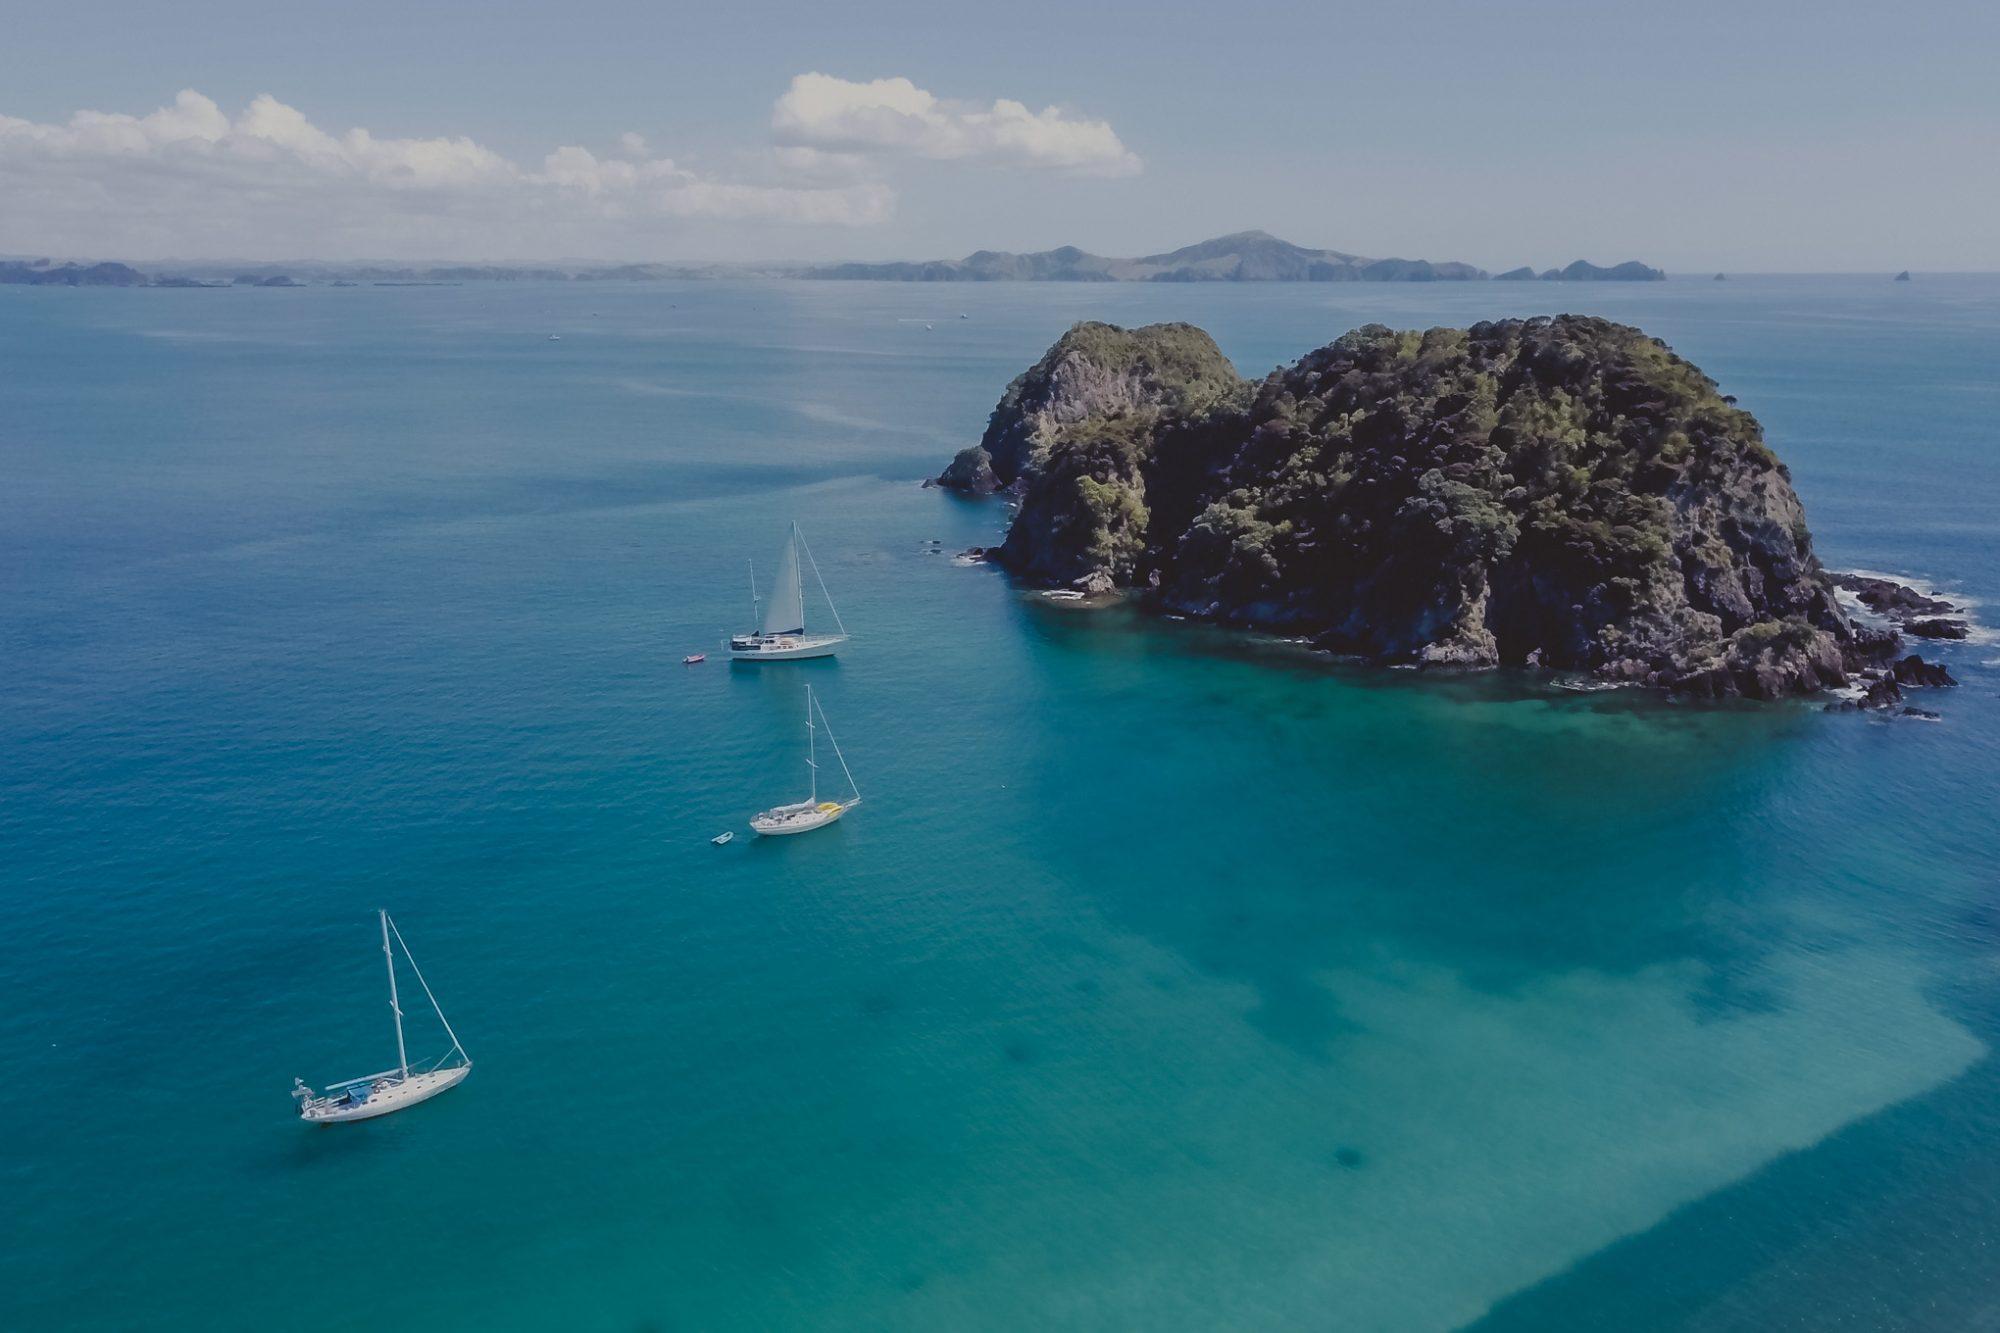 Bay of Islands Vigilant Yacht Tour